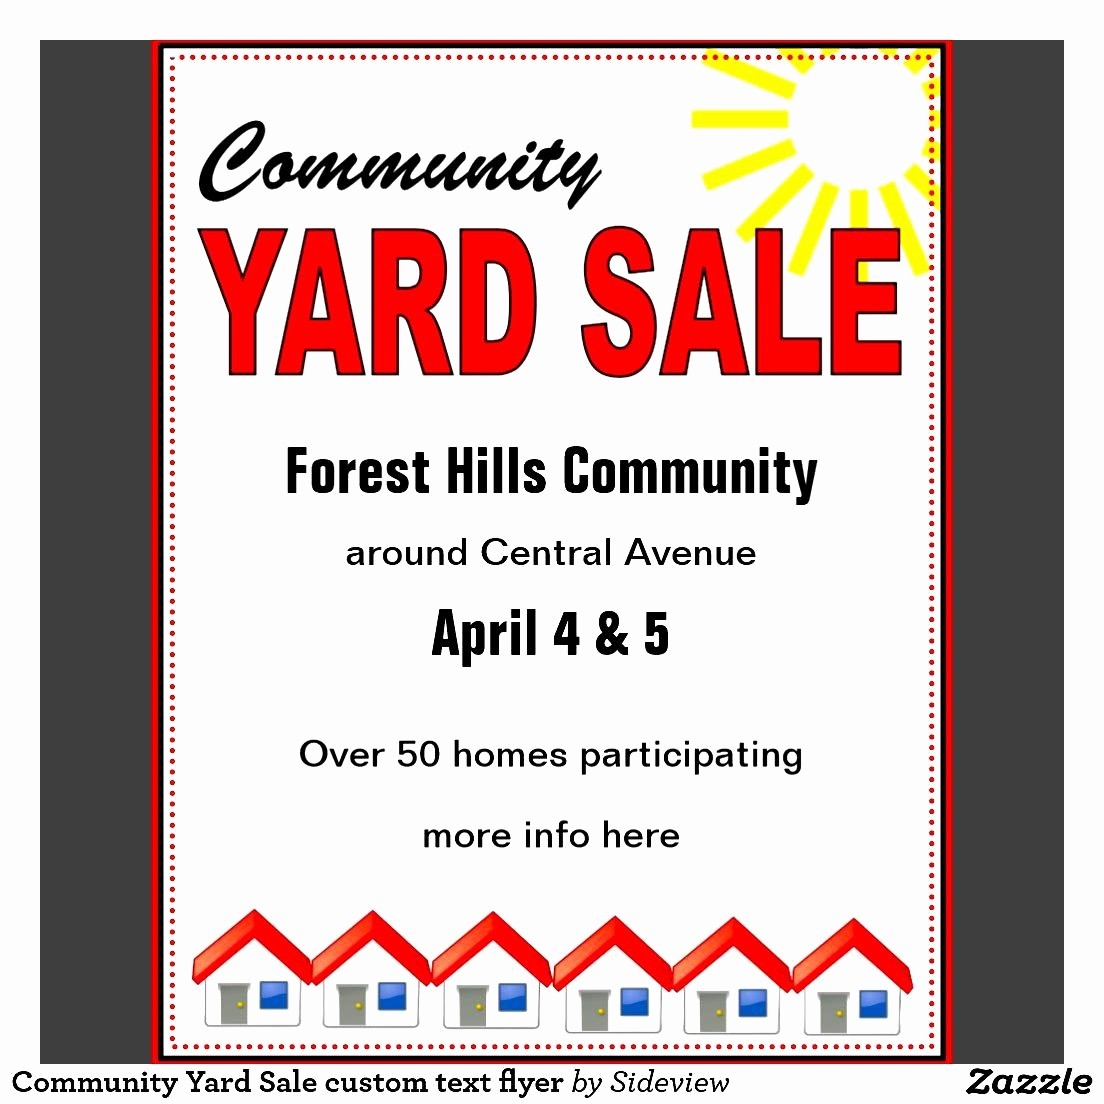 Free Printable Yard Sale Flyers Inspirational Munity Yard Sale Flyer Template Yourweek B31bebeca25e